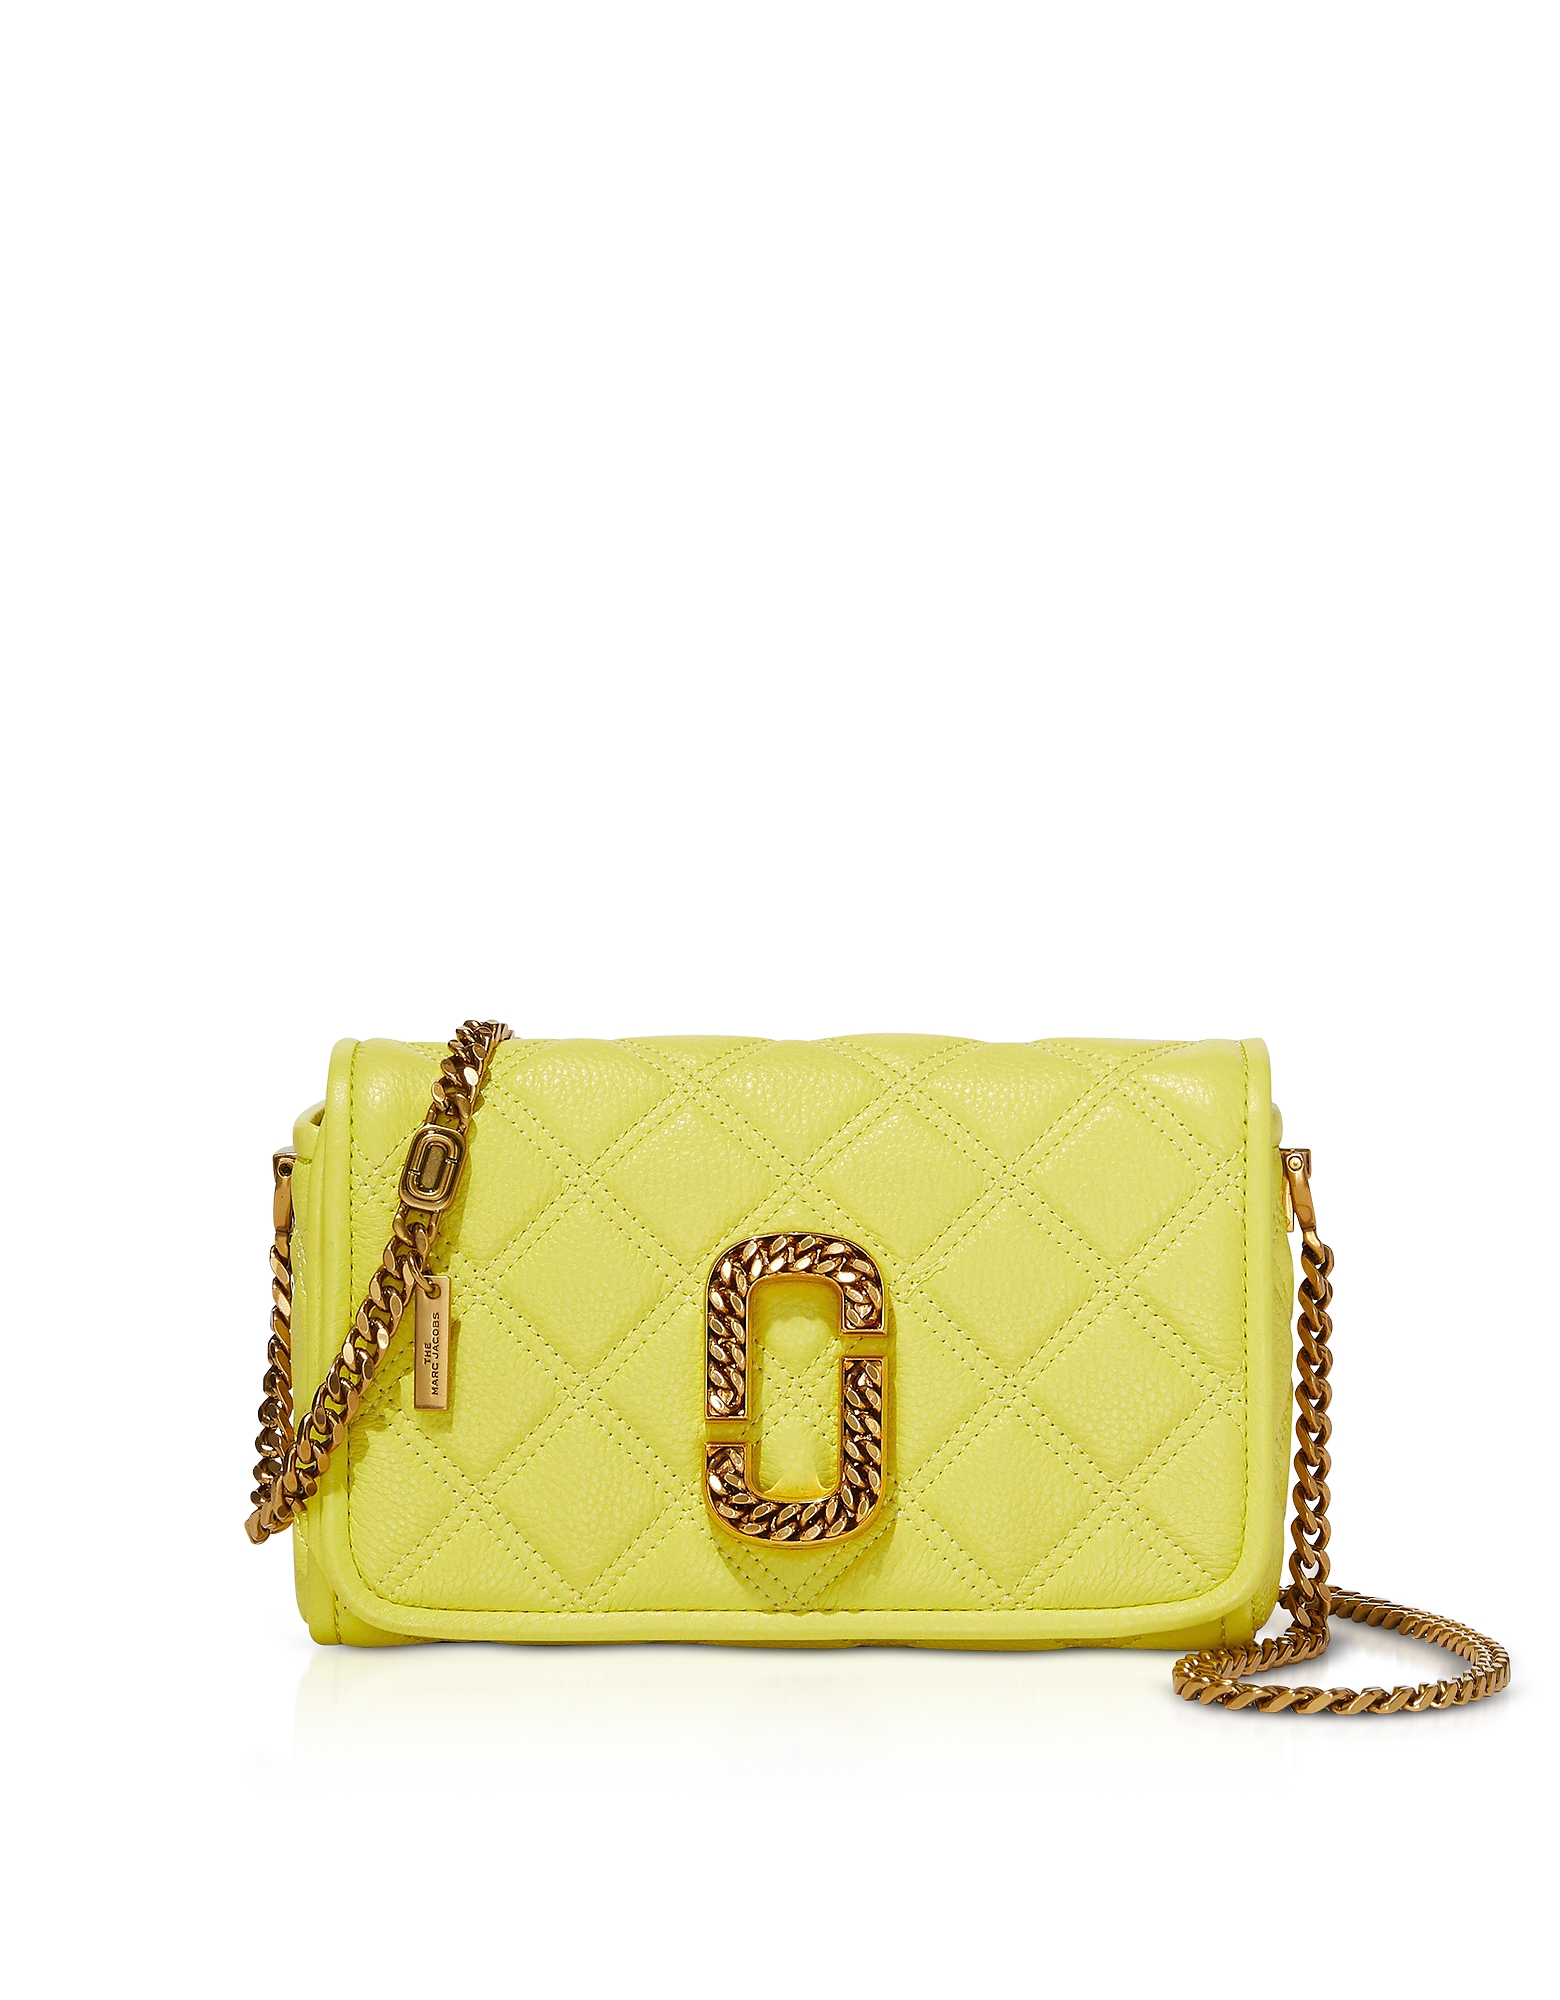 Marc Jacobs Designer Handbags, The Status Flap Quilted Leather Shoulder Bag